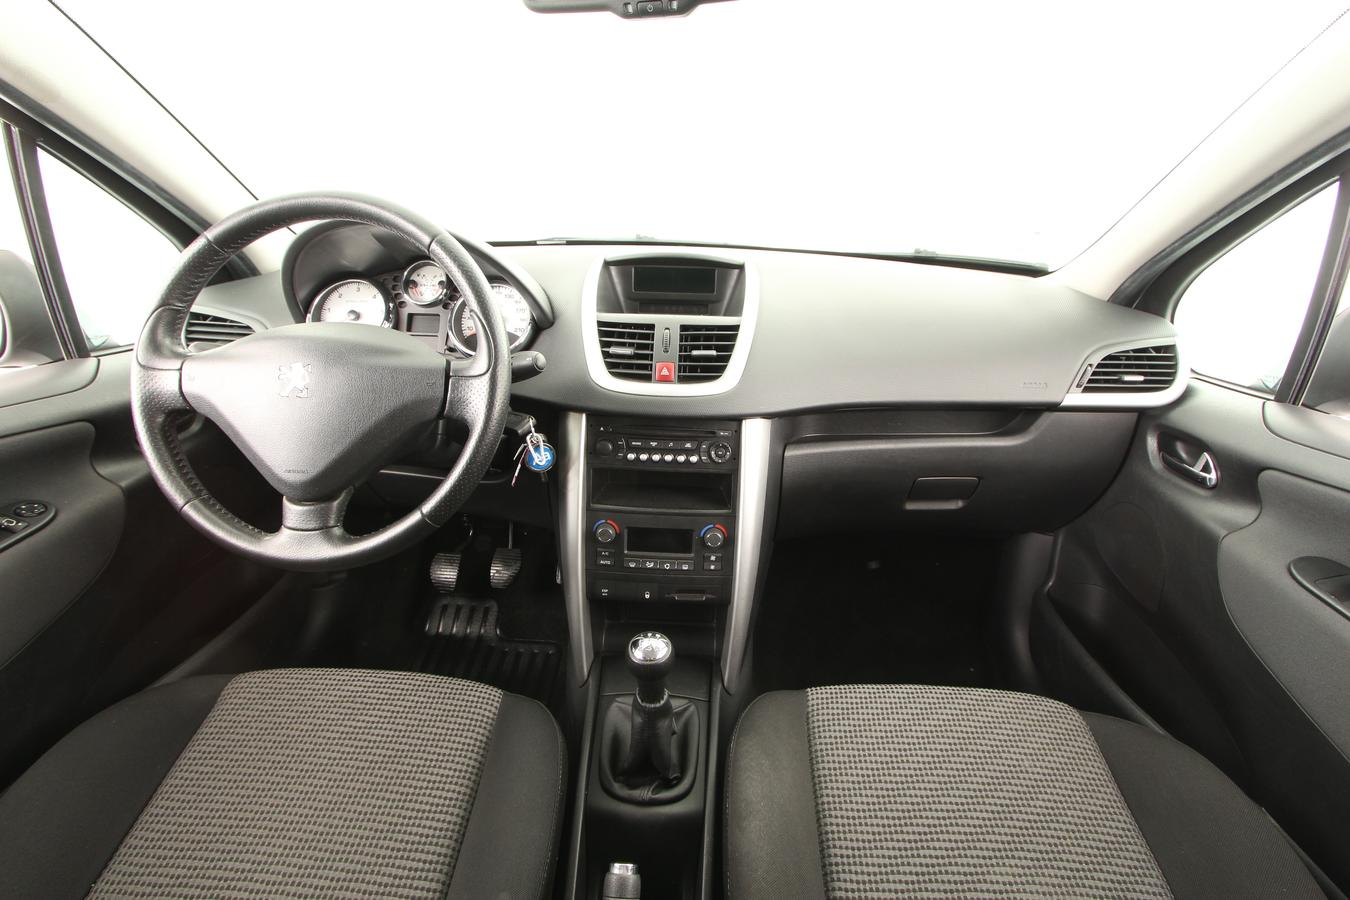 Peugeot 207 citadine 5 portes diesel 1 6 hdi 90ch - Peugeot 207 occasion diesel 5 portes ...